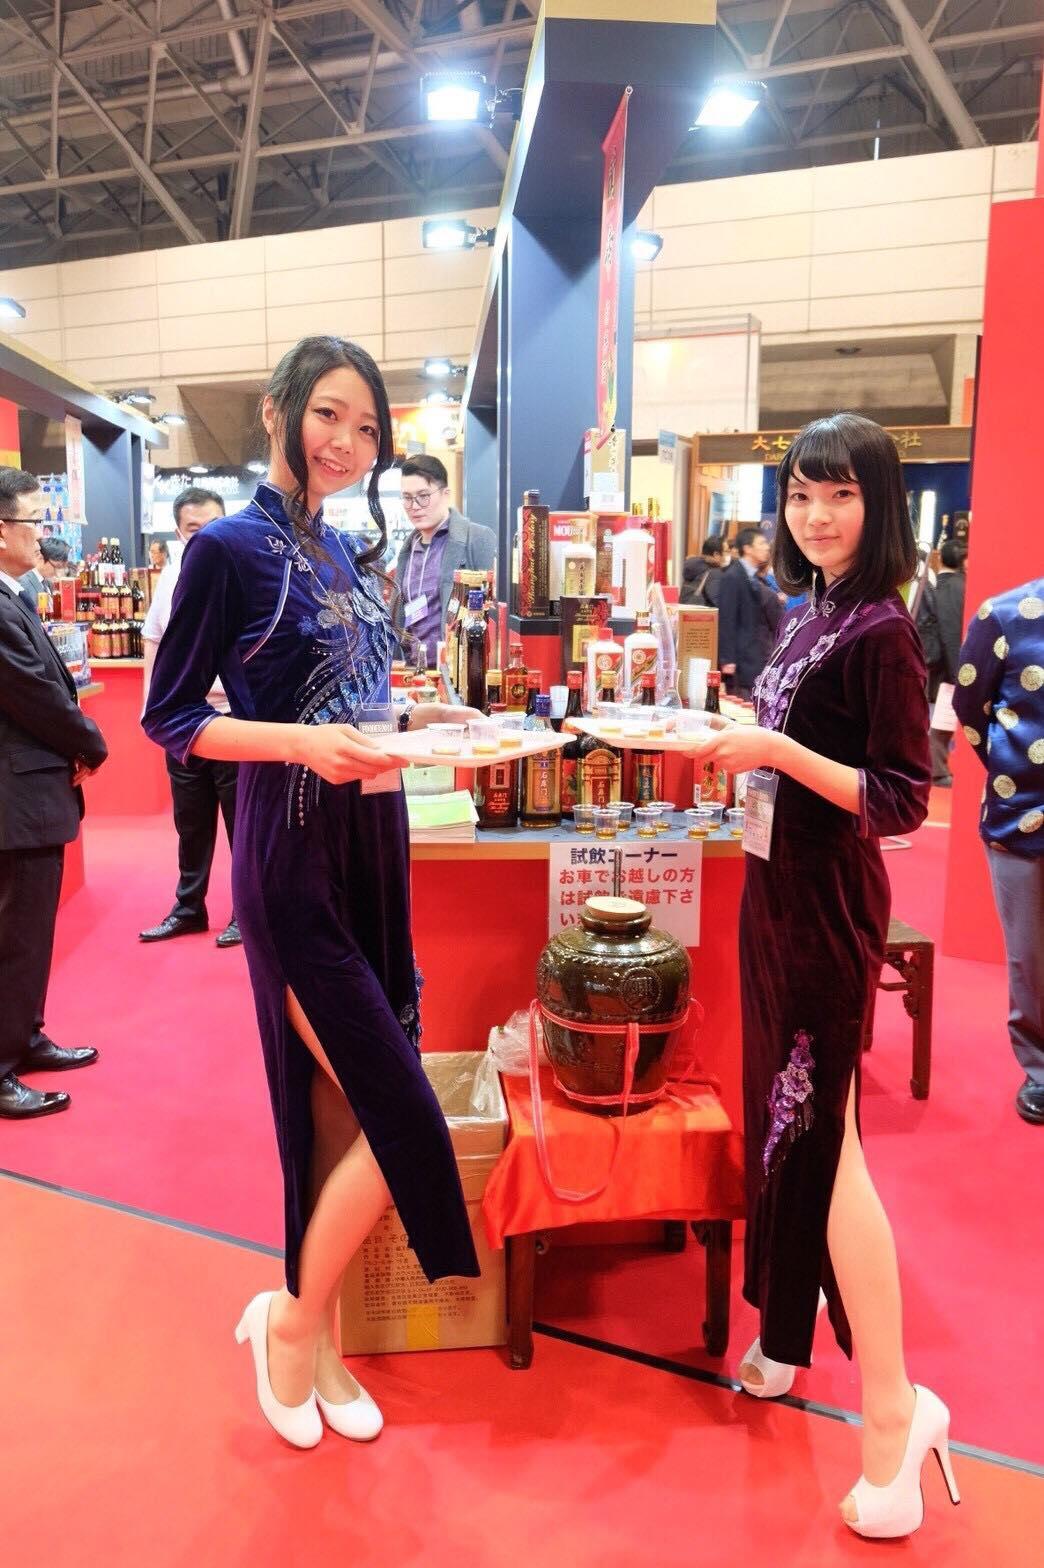 FOODEX 2018(第43回国際食品・飲料展) @幕張メッセ